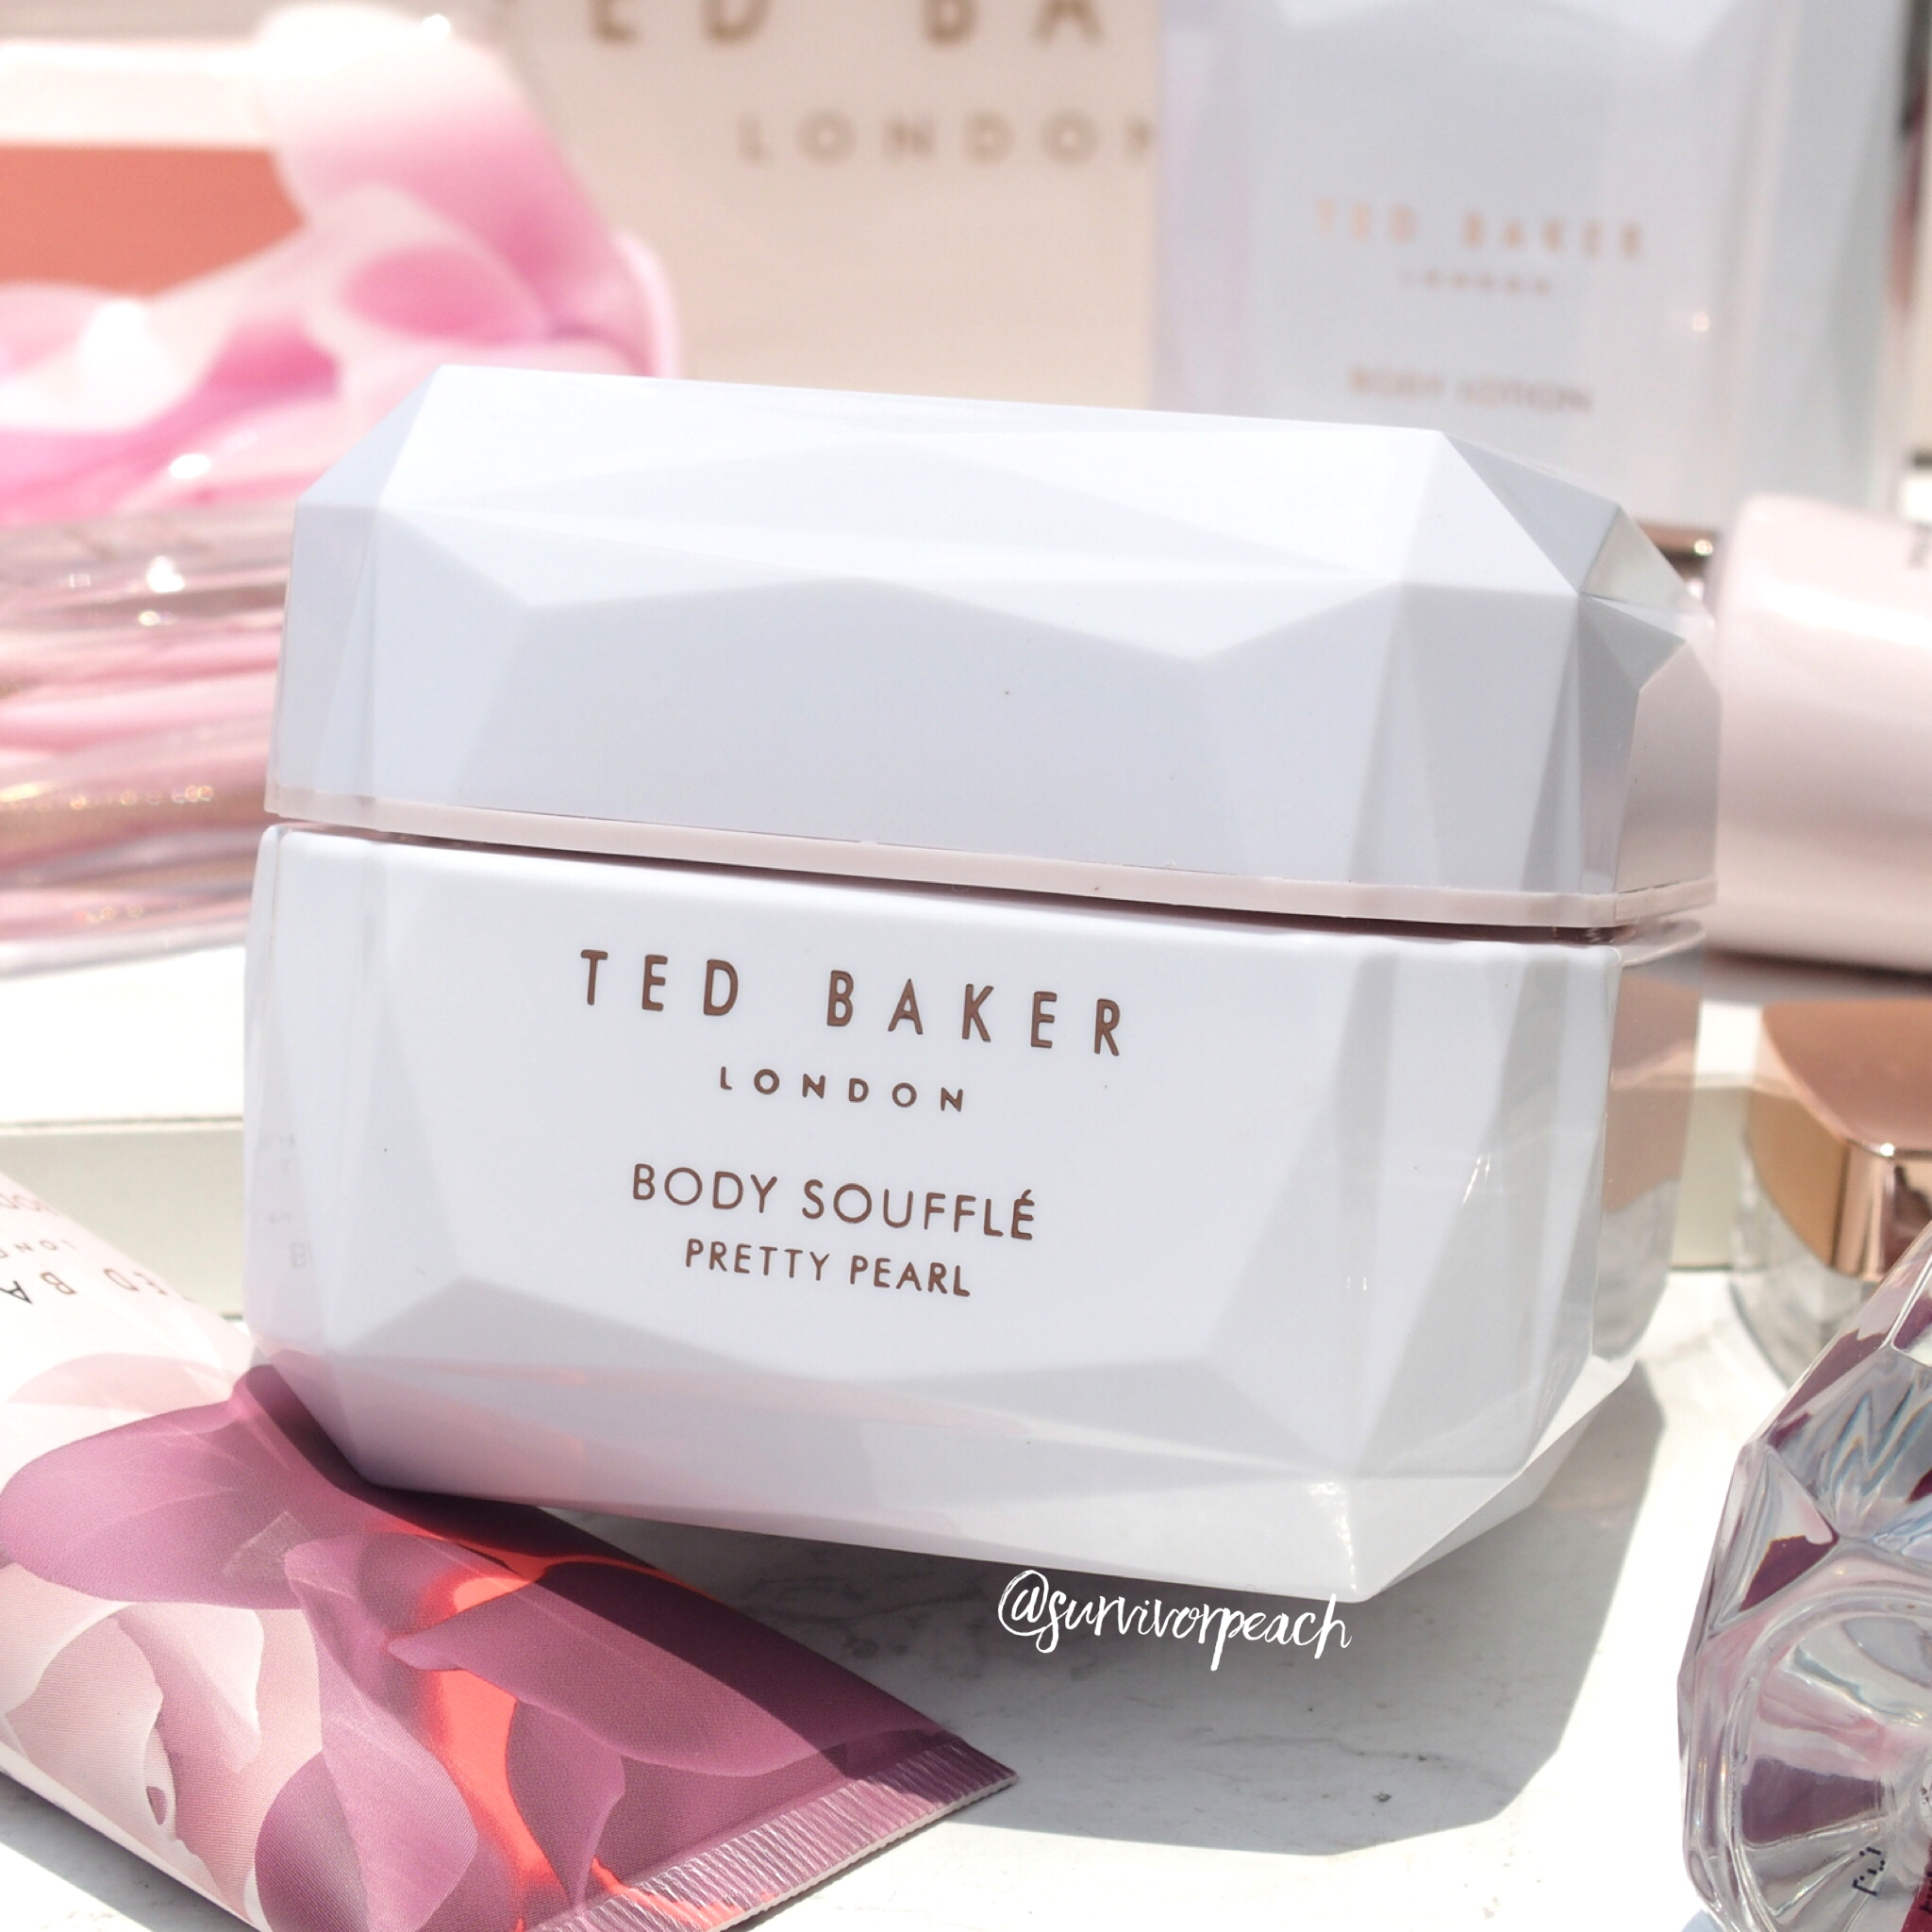 Ted Baker Pretty Pearl Body Souffle